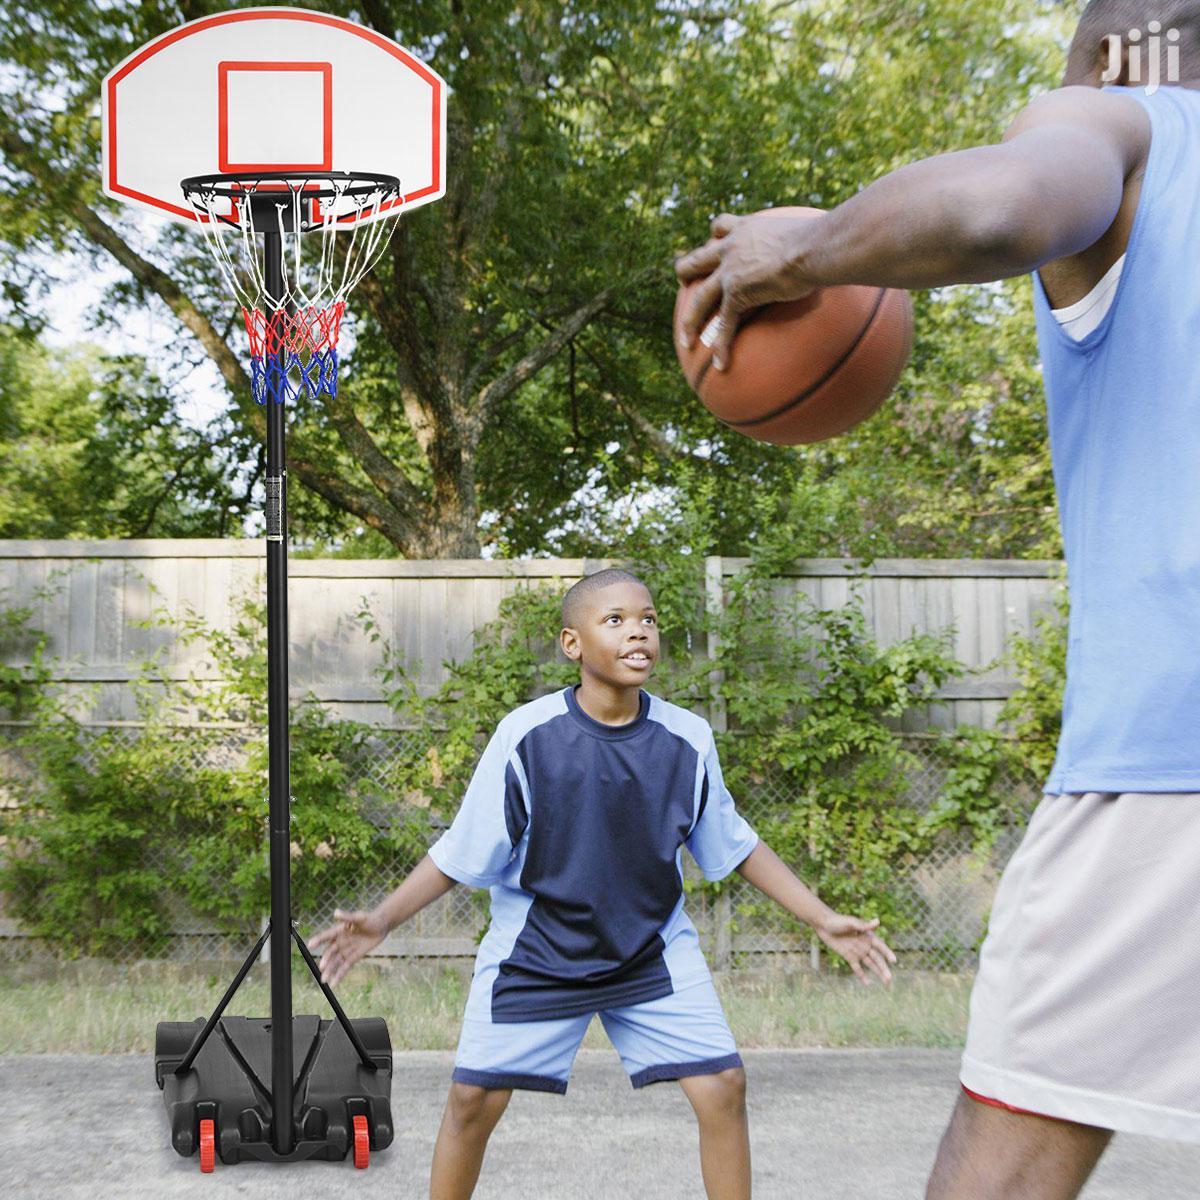 Kids Basketball Stan Hoop System Free Ball New 7ft